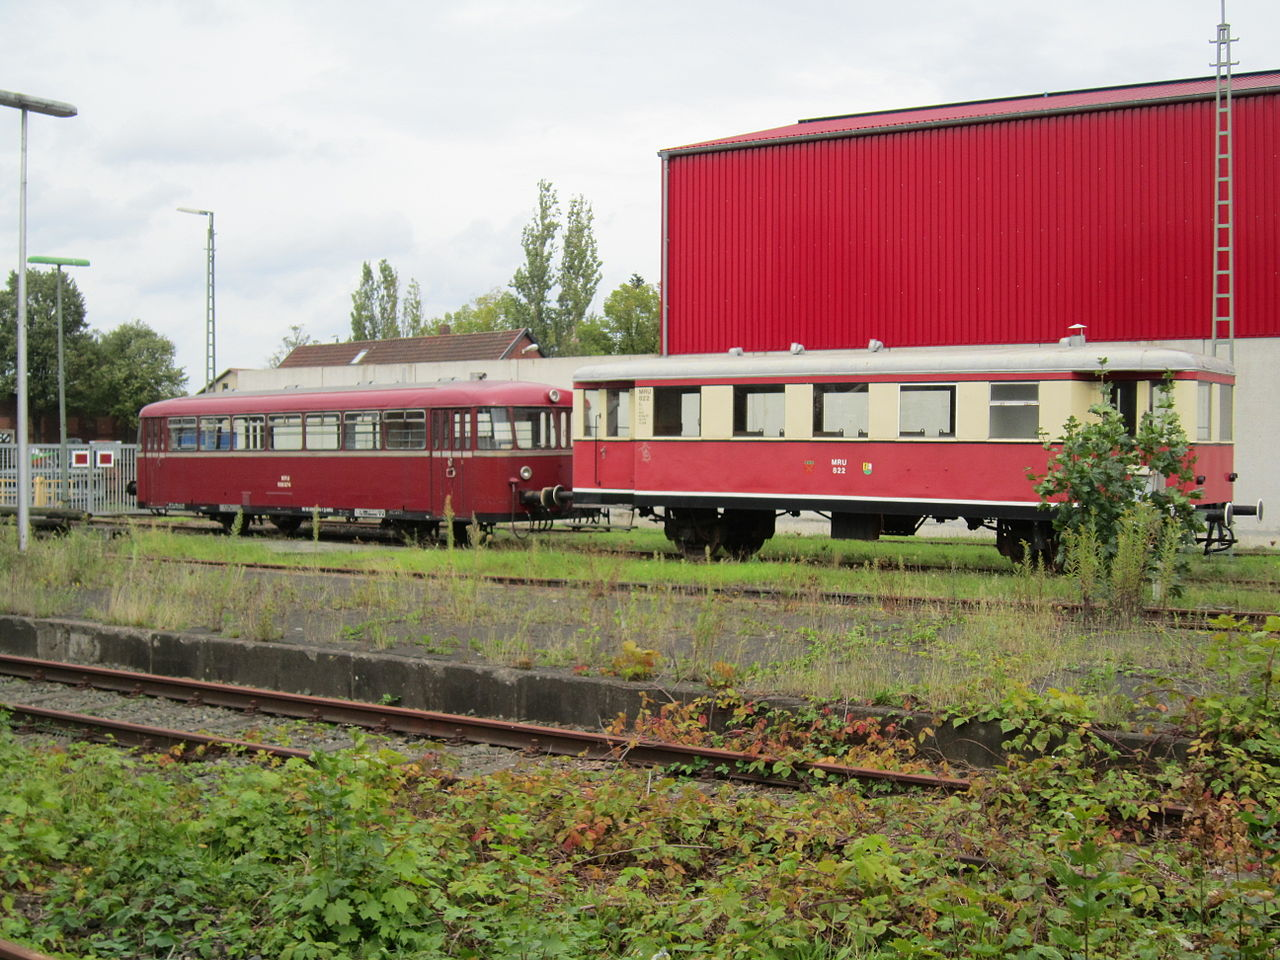 Bild Museumsbahn Rahden Uchte